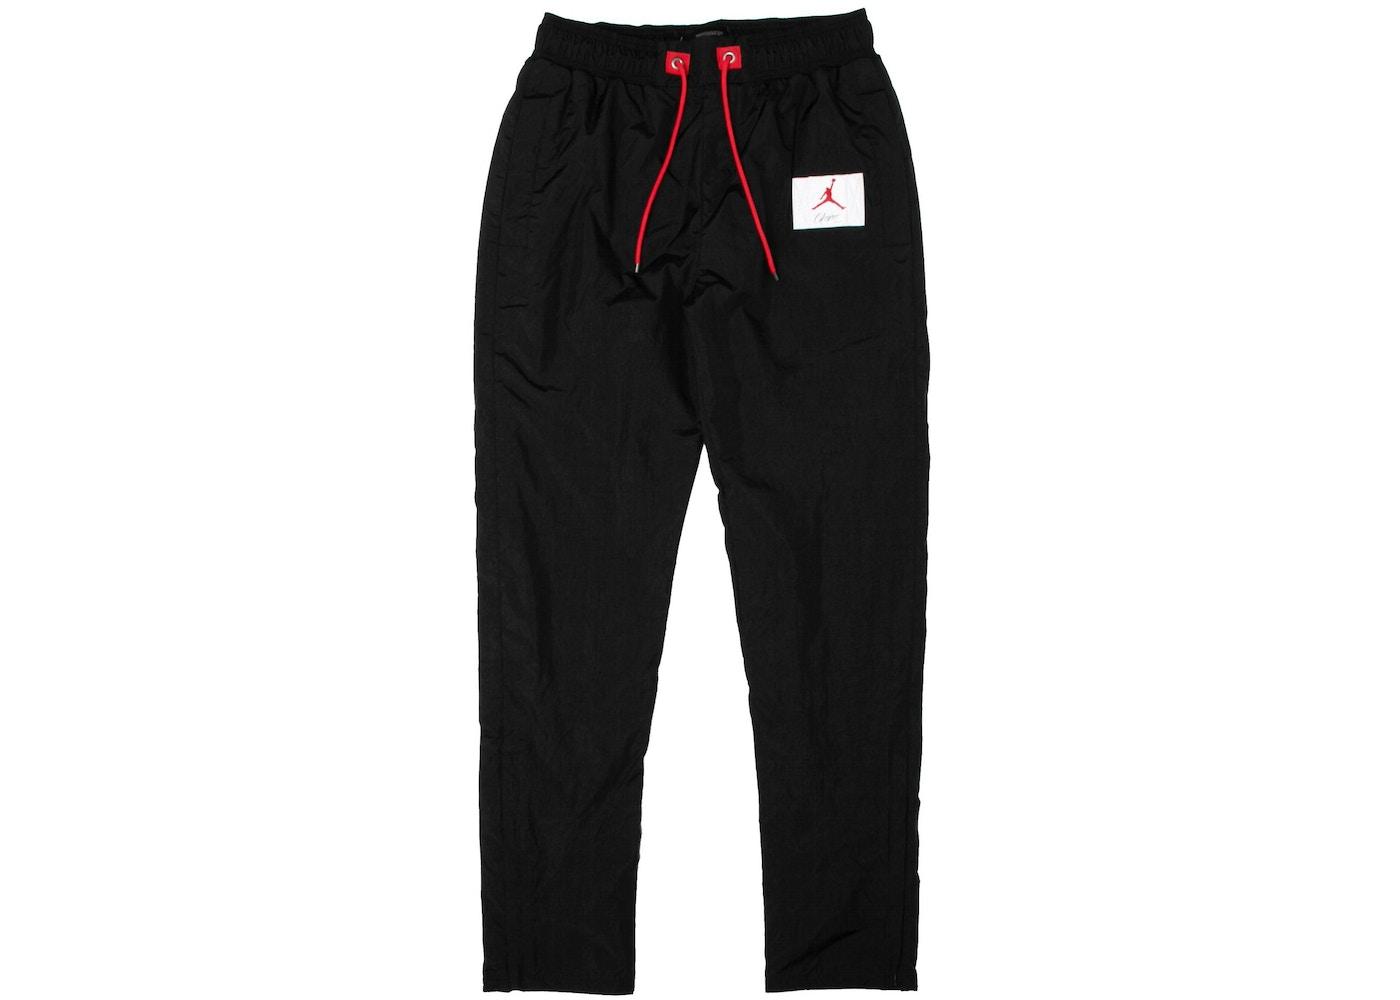 119b8dfc Buy & Sell Streetwear - New Lowest Asks